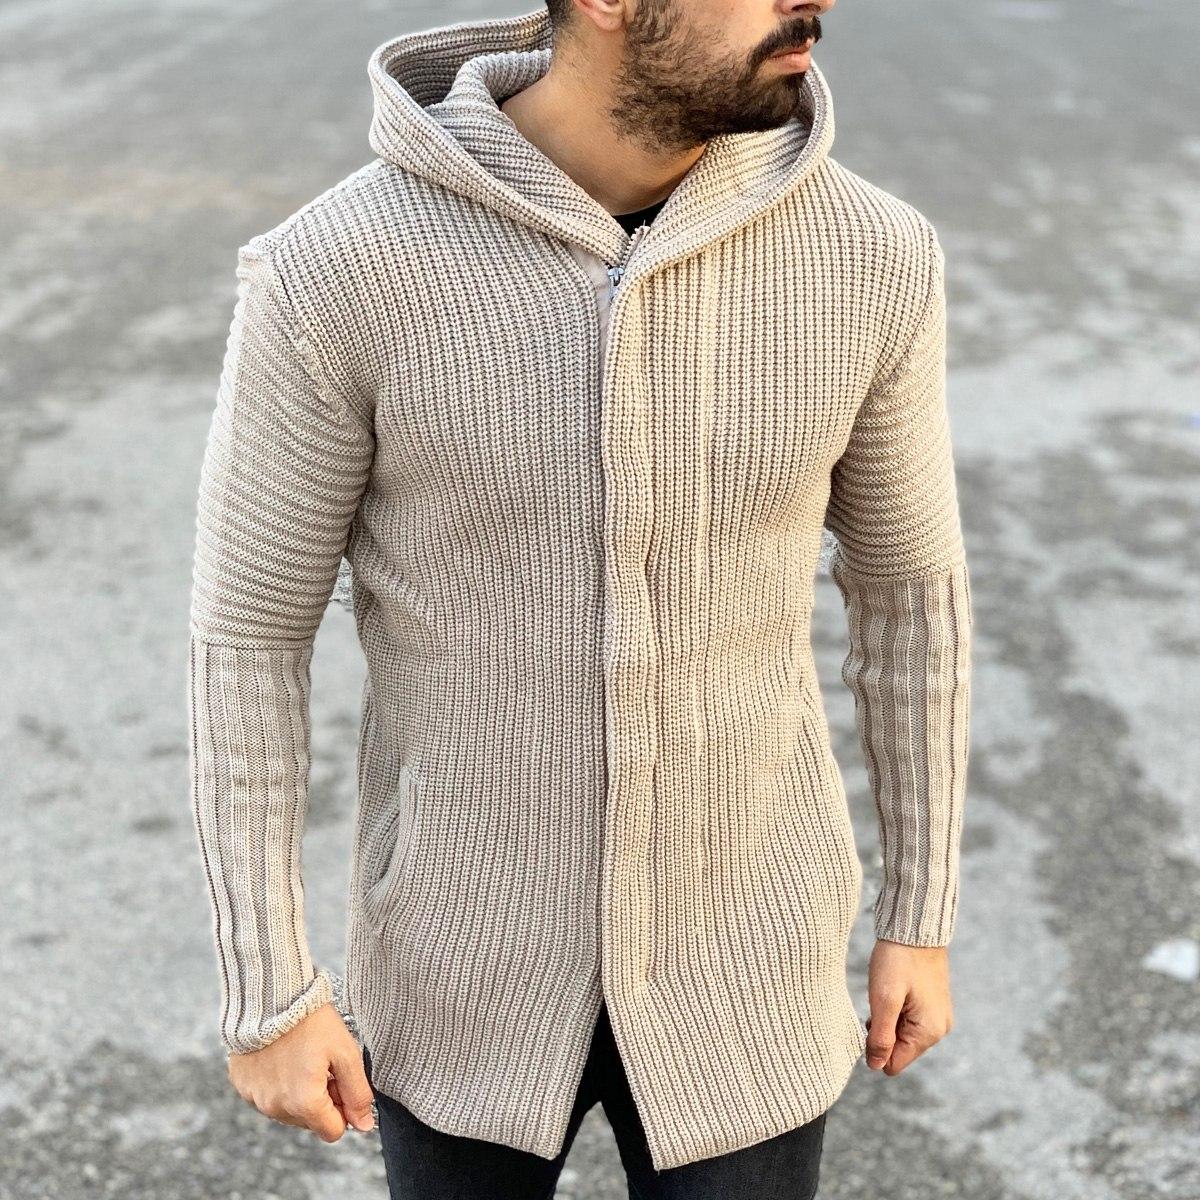 Classic Hooded Cardigan Jacket in Beige